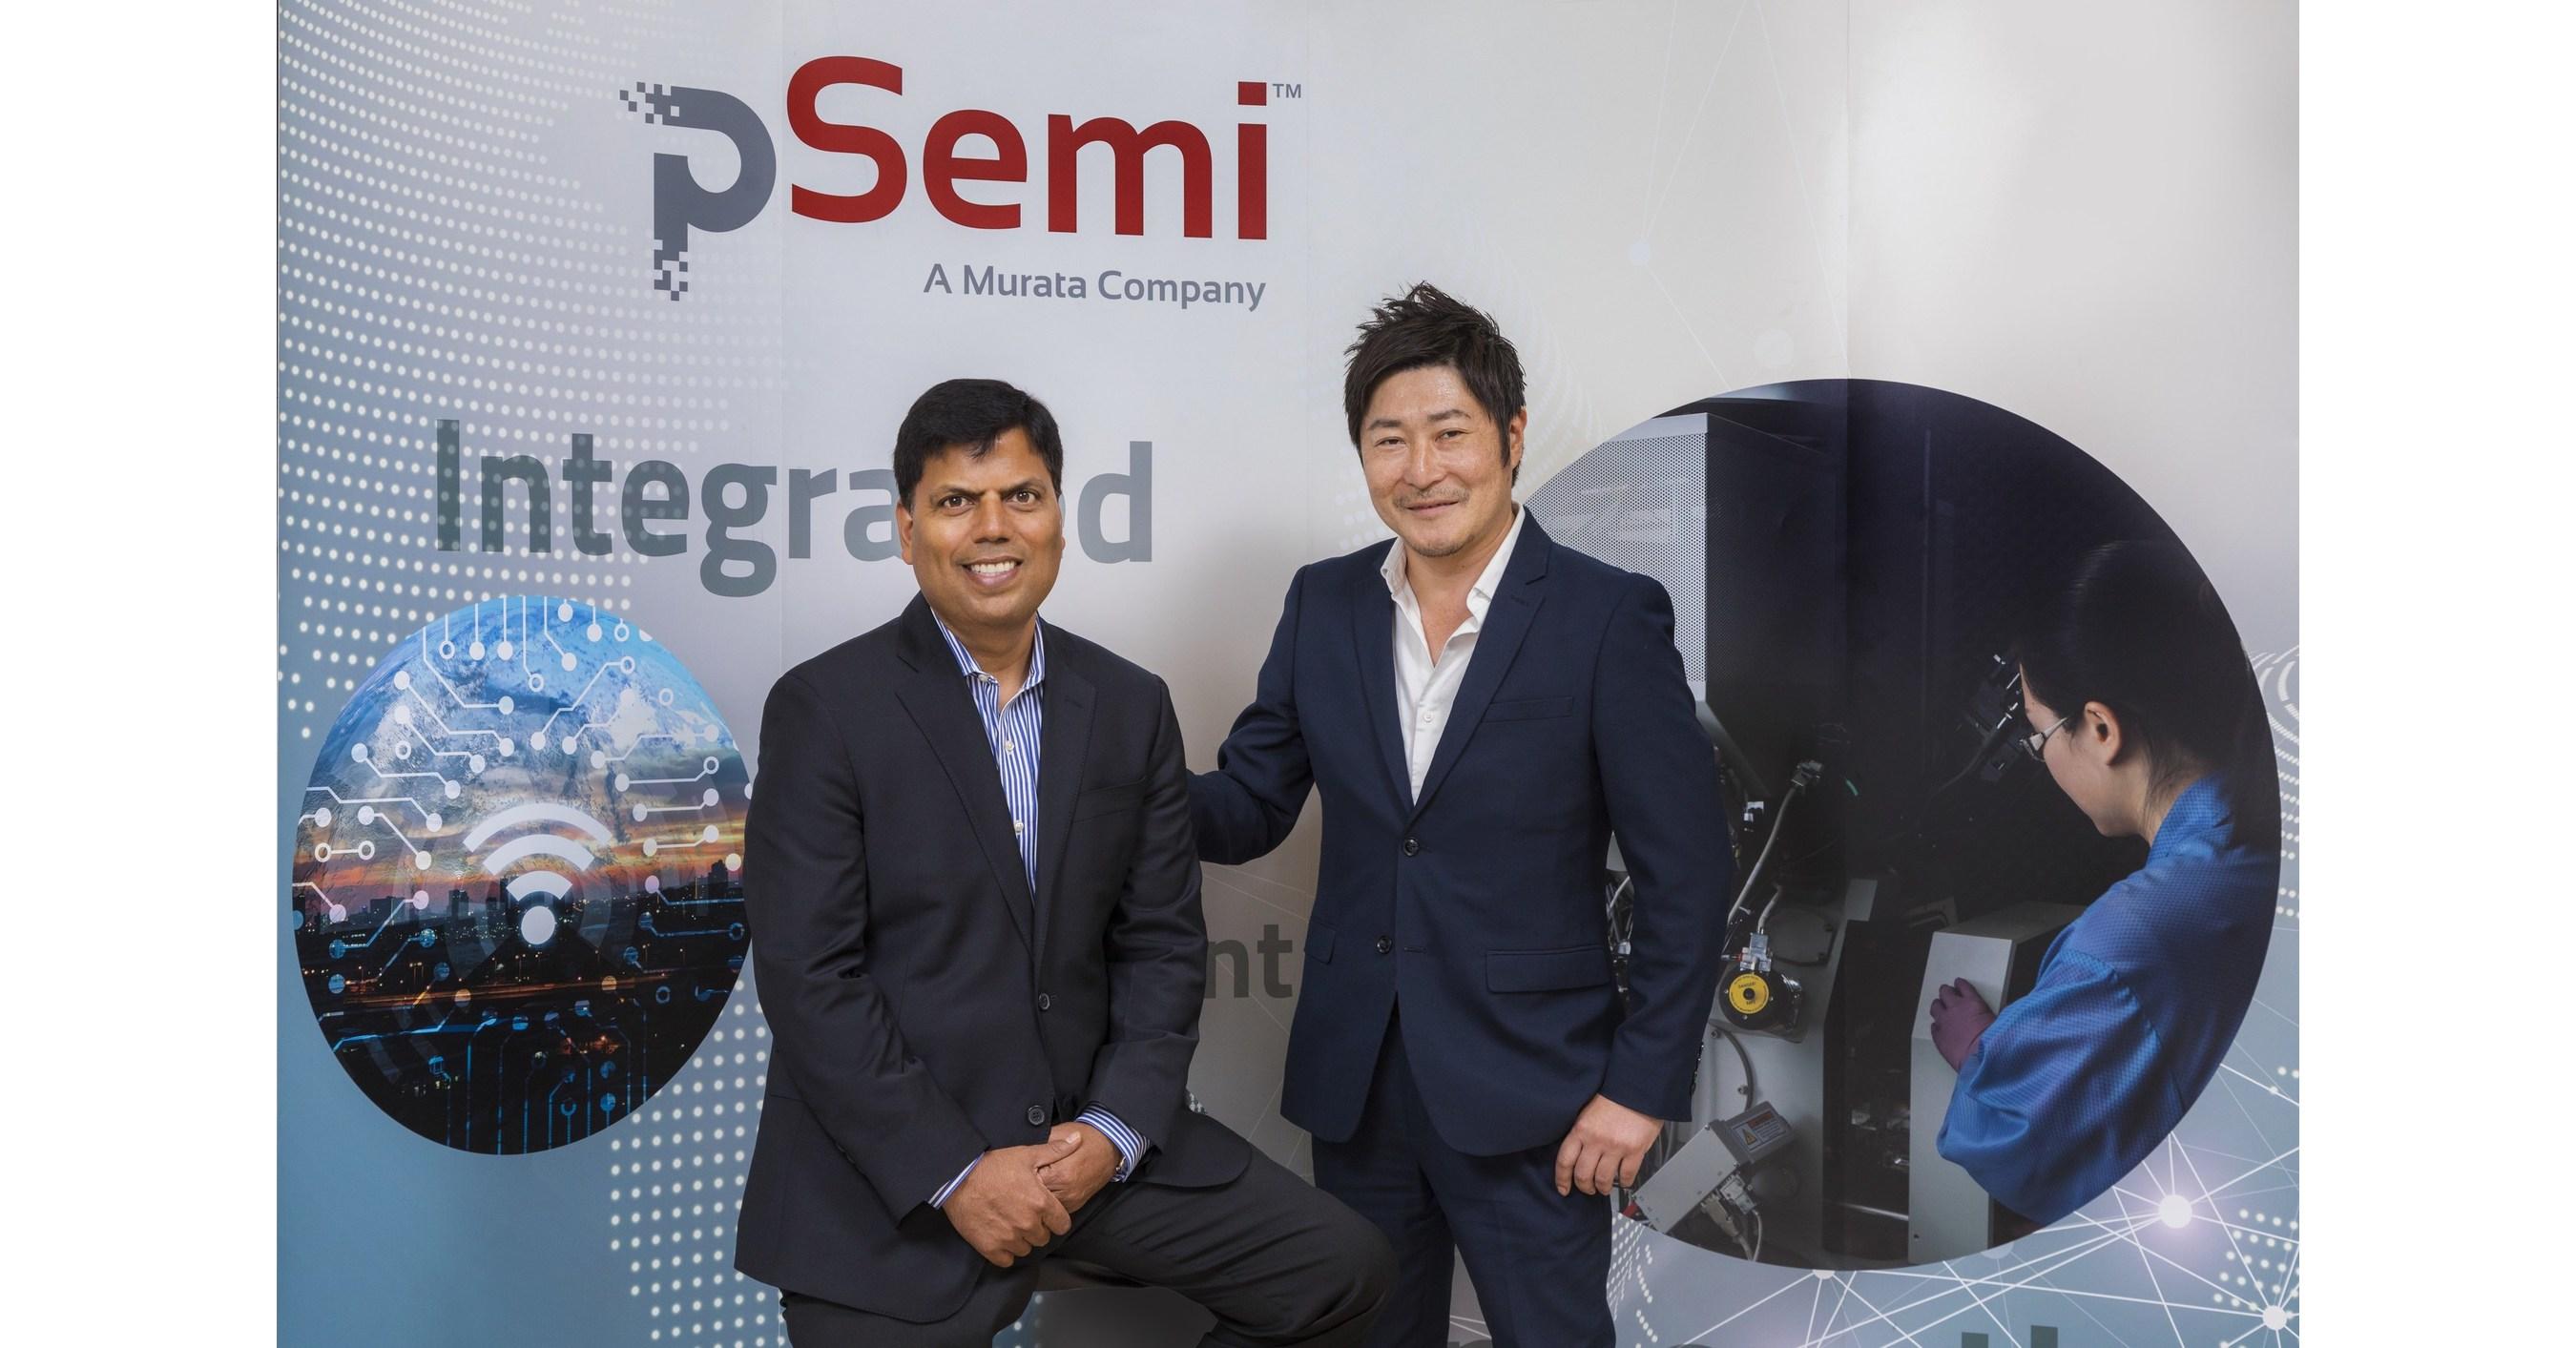 pSemi Announces New Leadership Structure